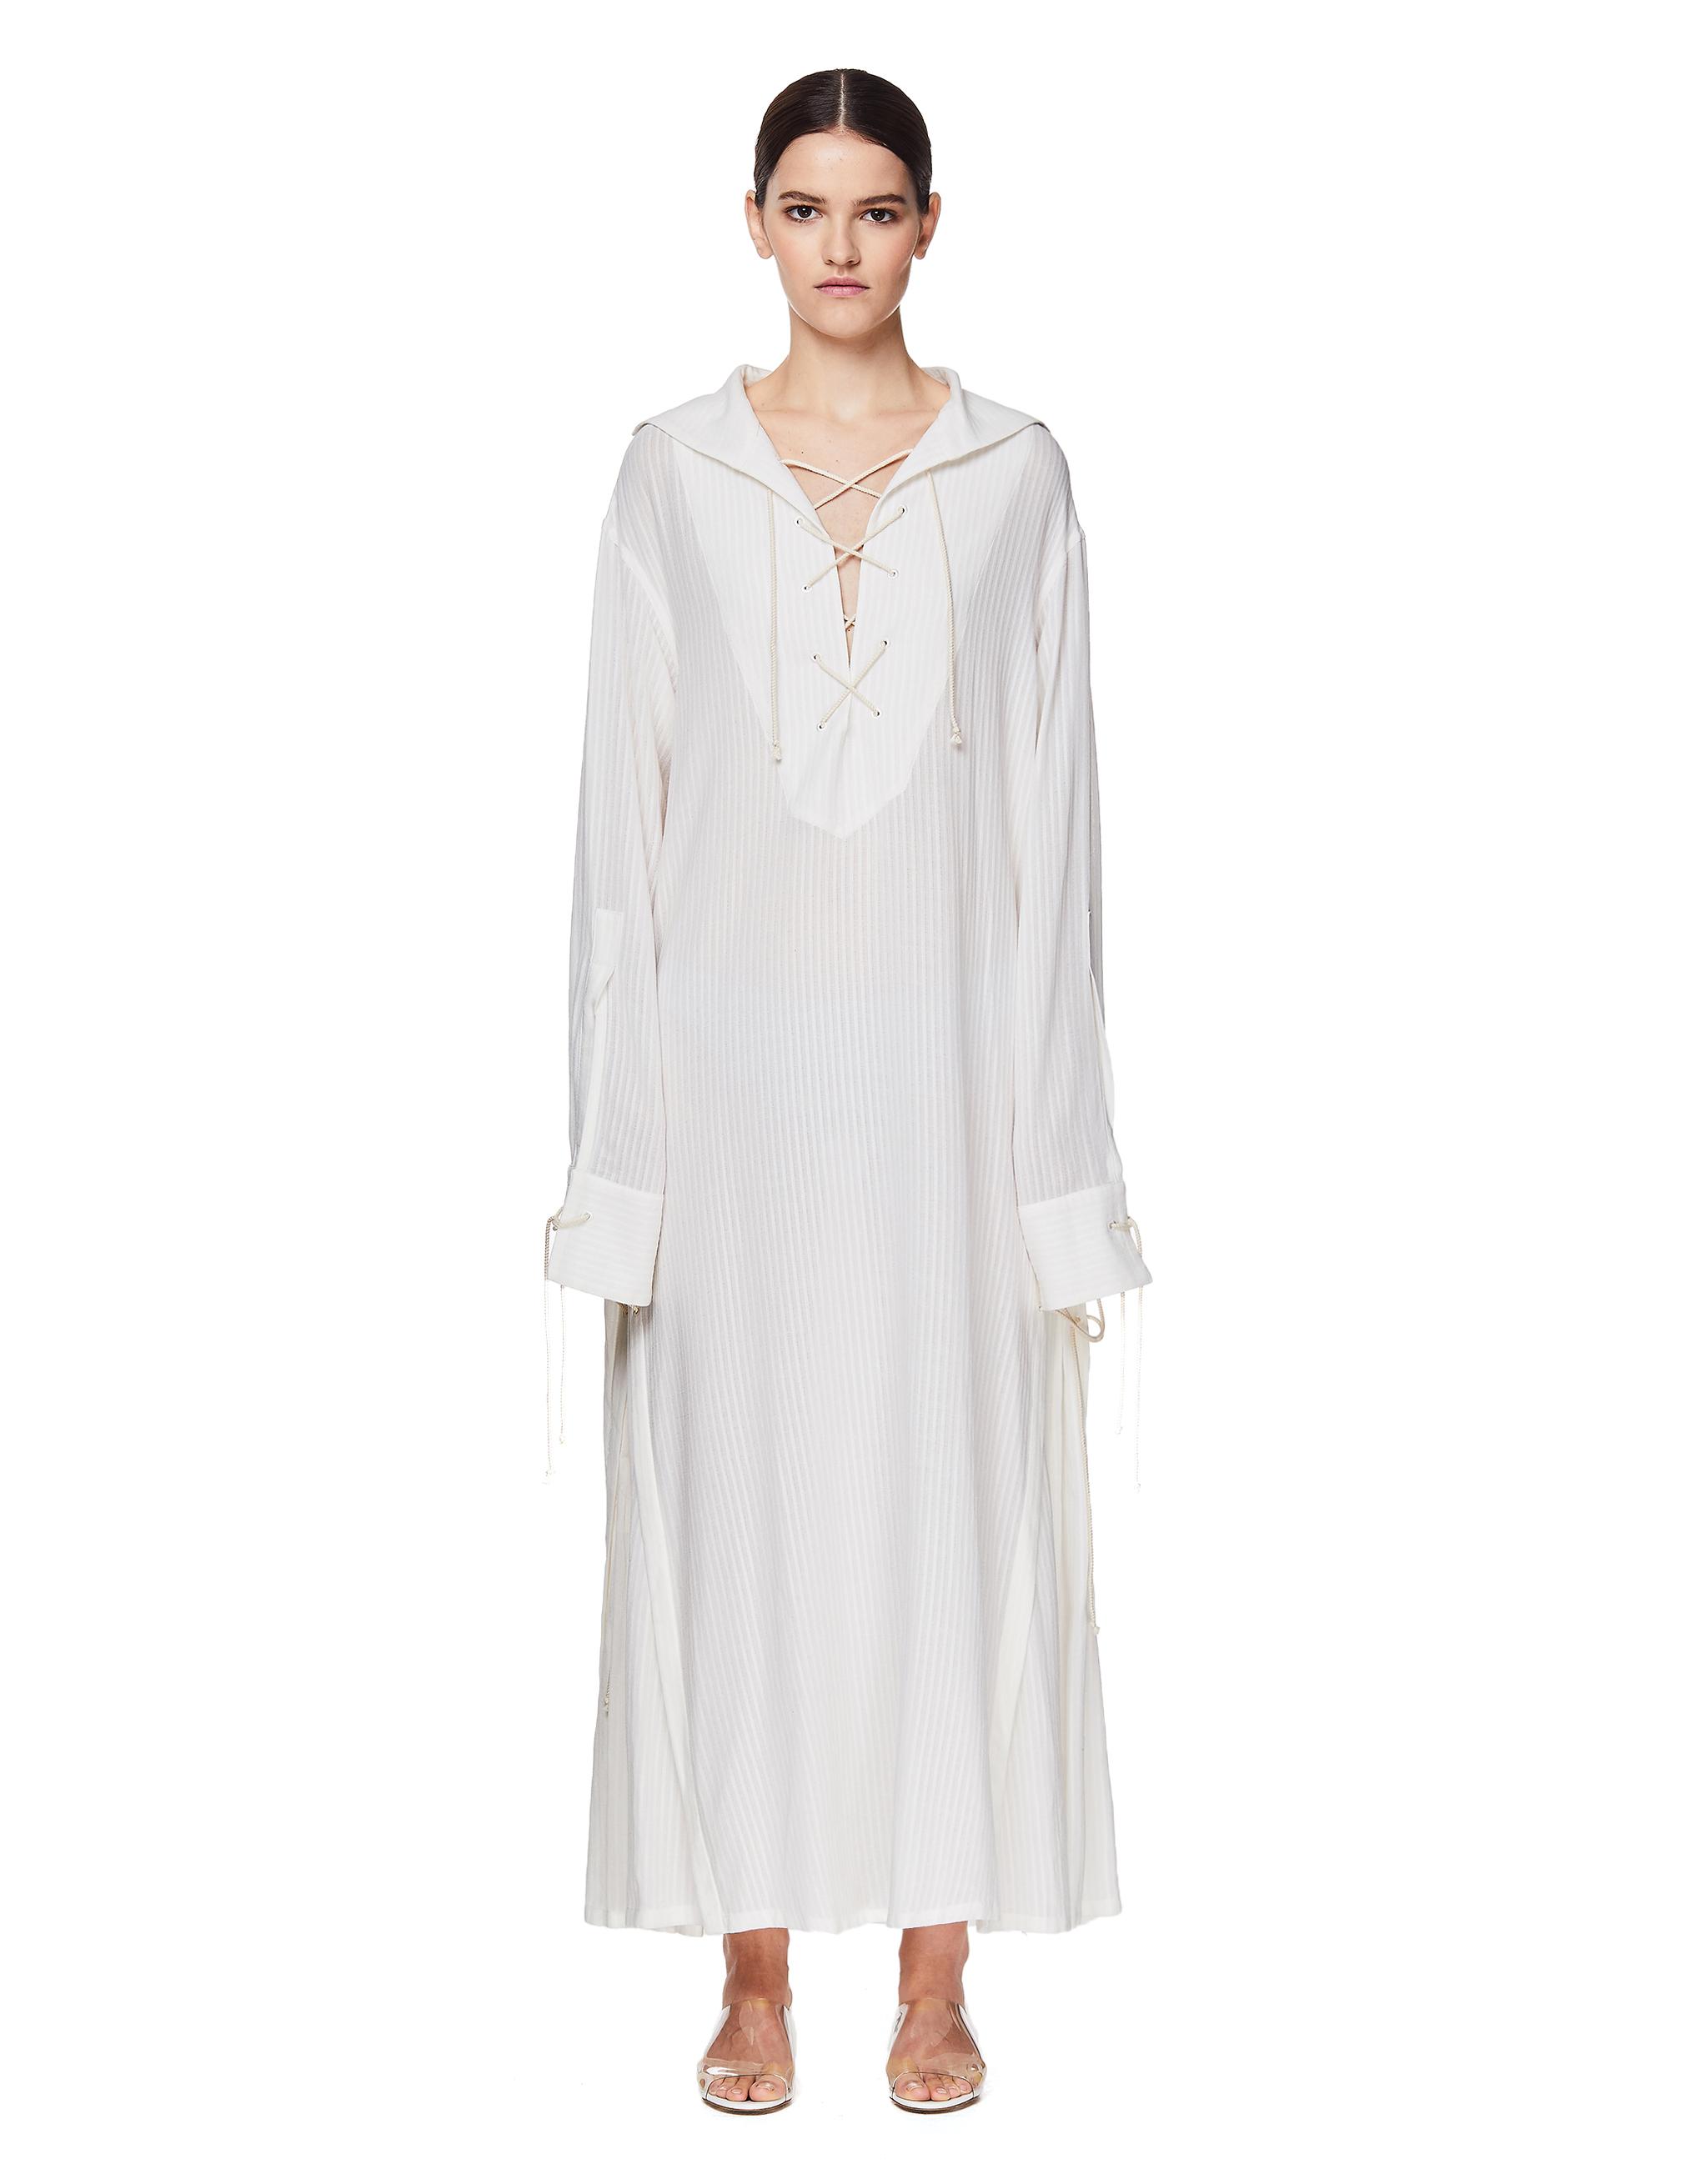 Ann Demeulemeester White Maxi Dress